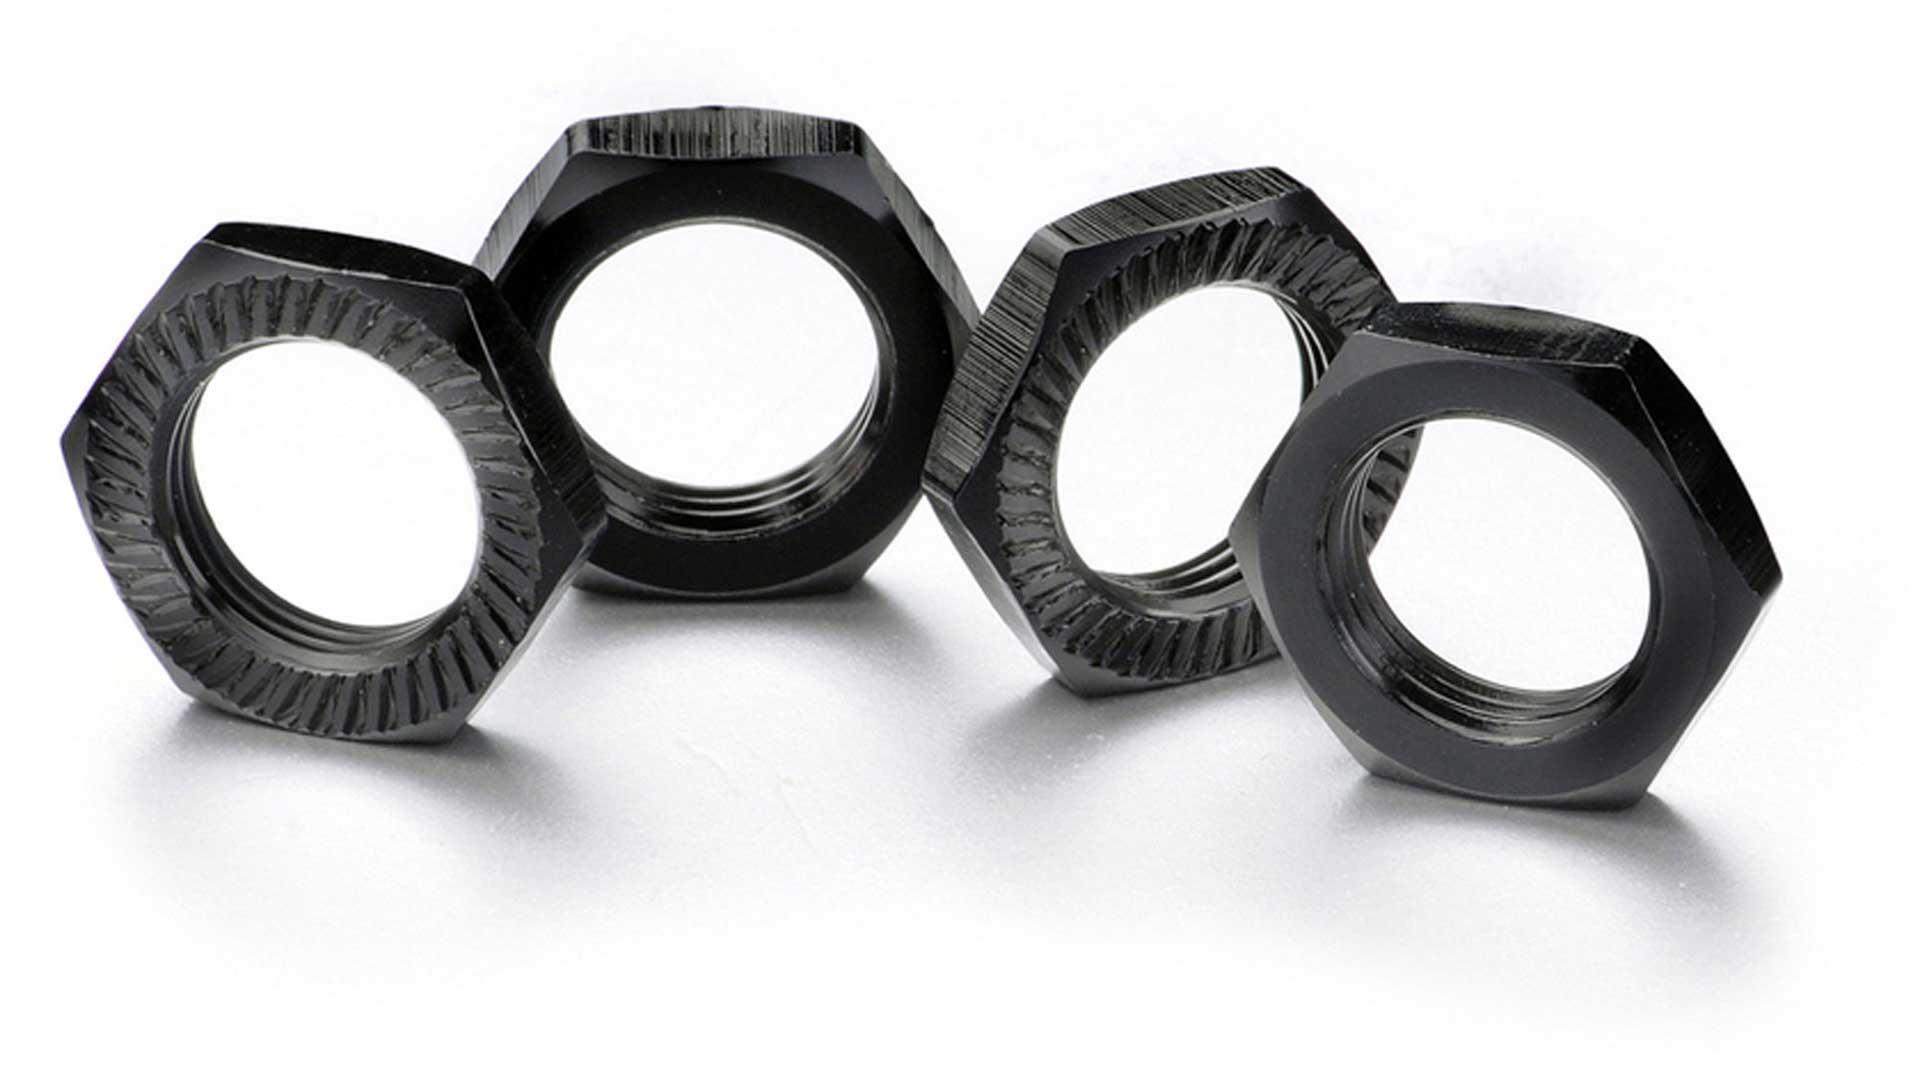 ABSIMA Wheel nut self-locking 17mm black (4)